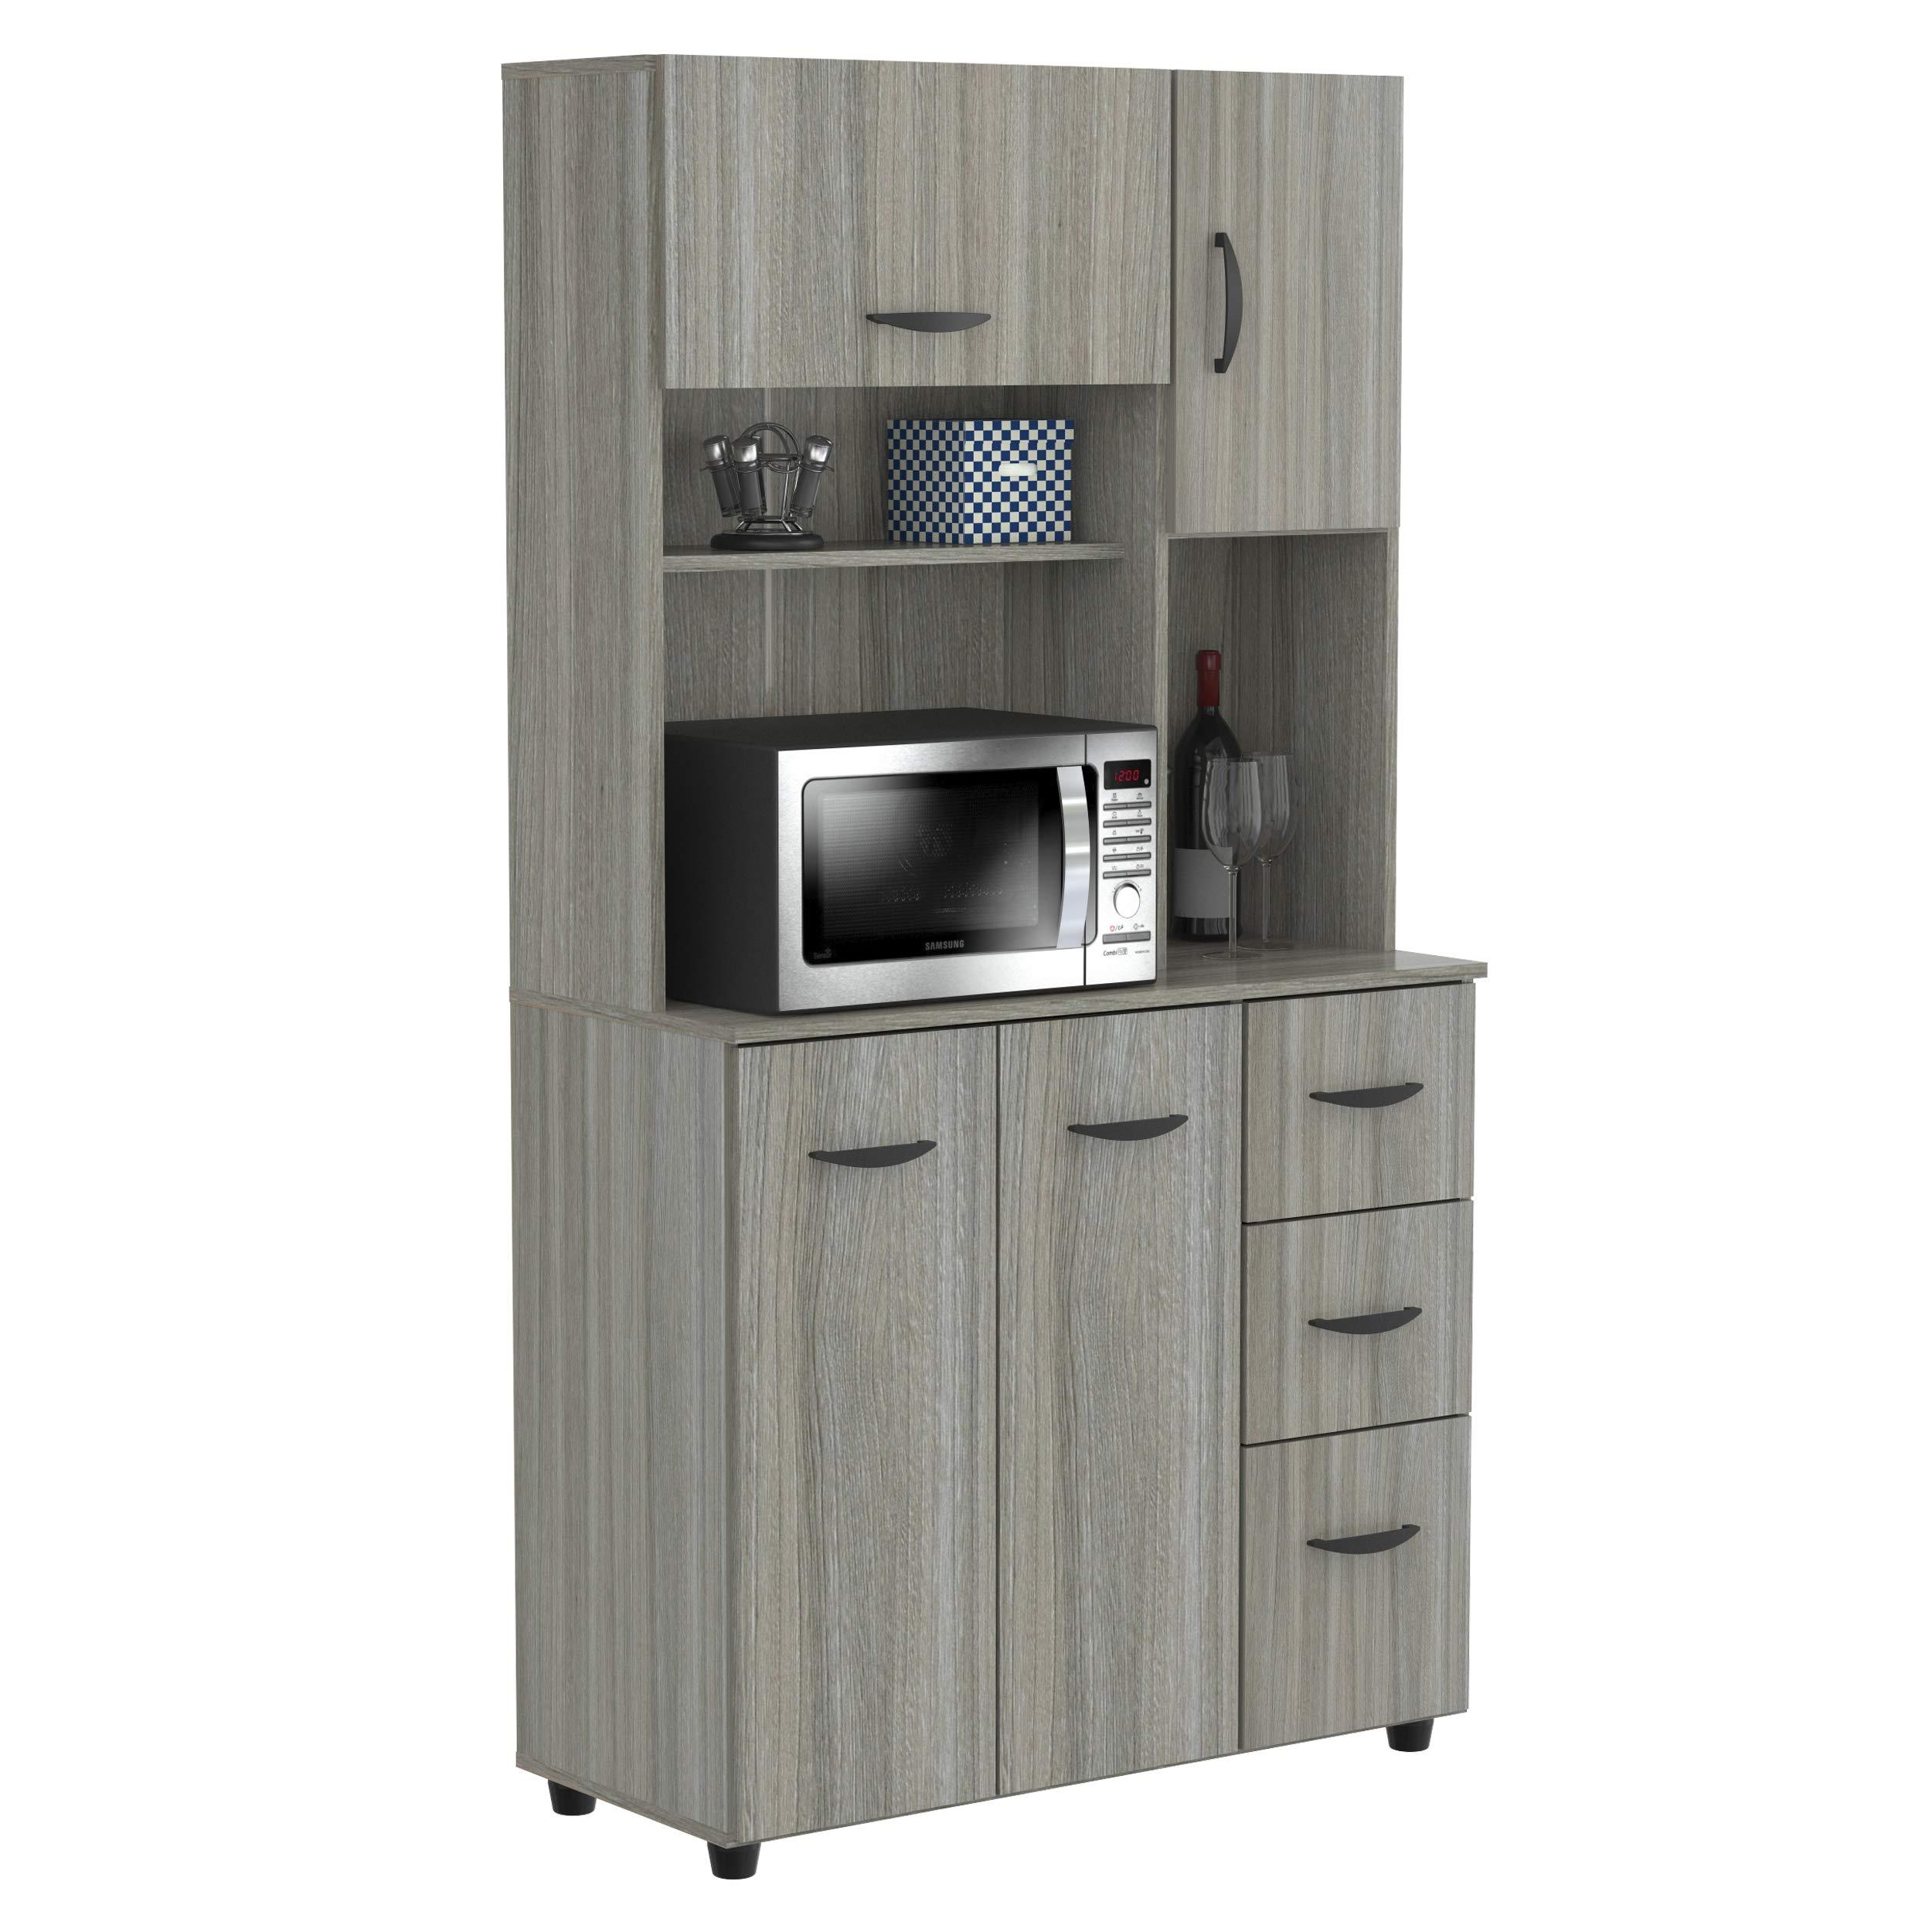 Inval GCM-063 Kitchen Microwave/Storage Cabinet, Smoke Oak by Inval